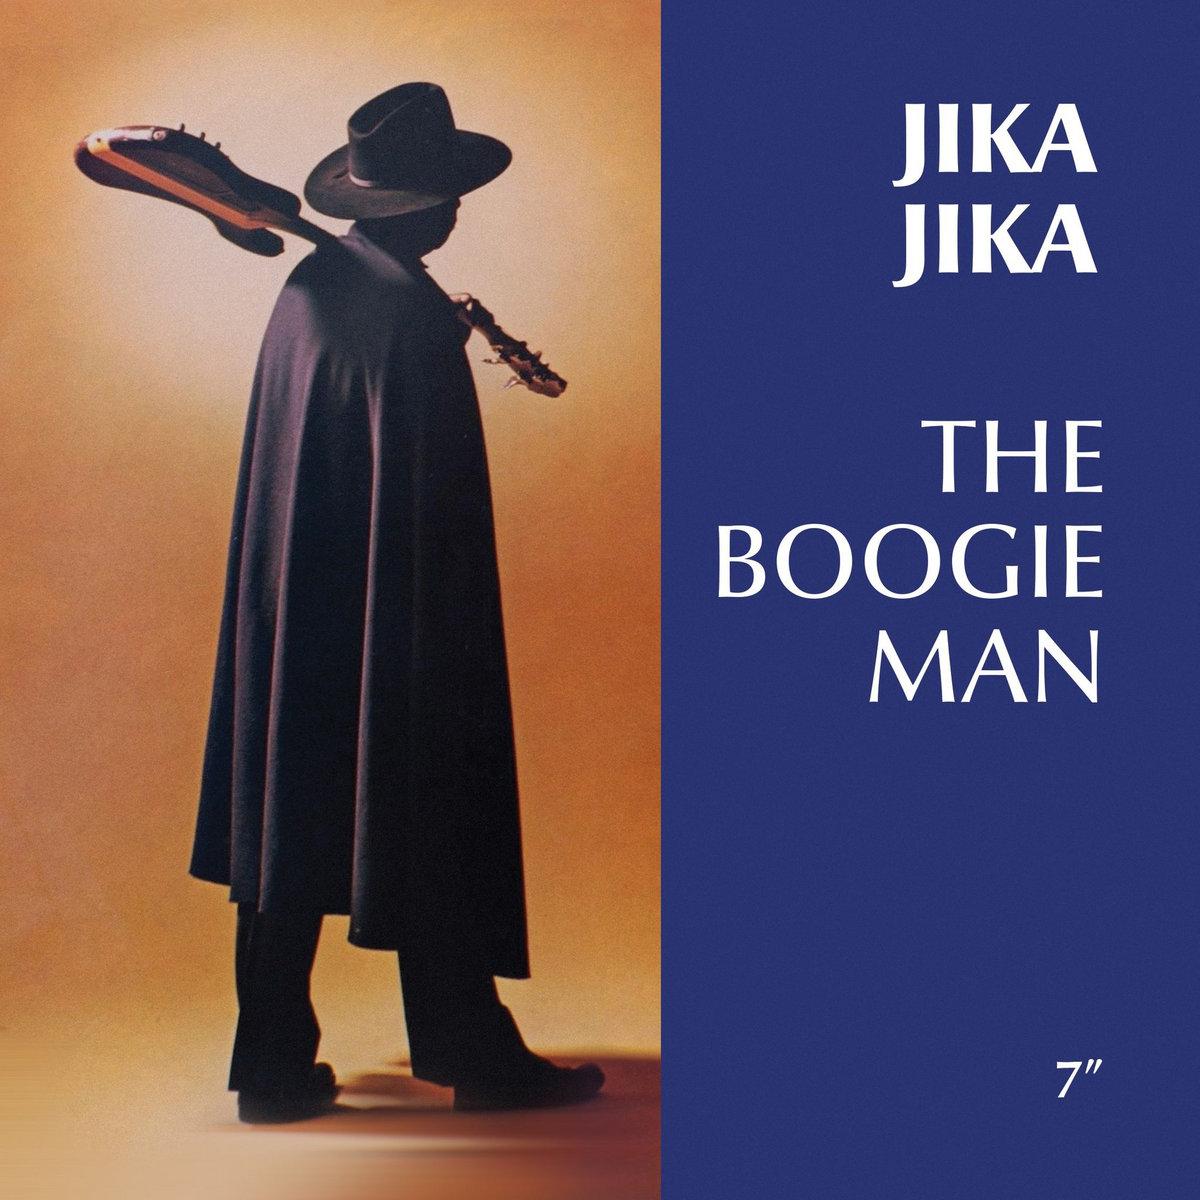 Jika Jika - The Boogie Man